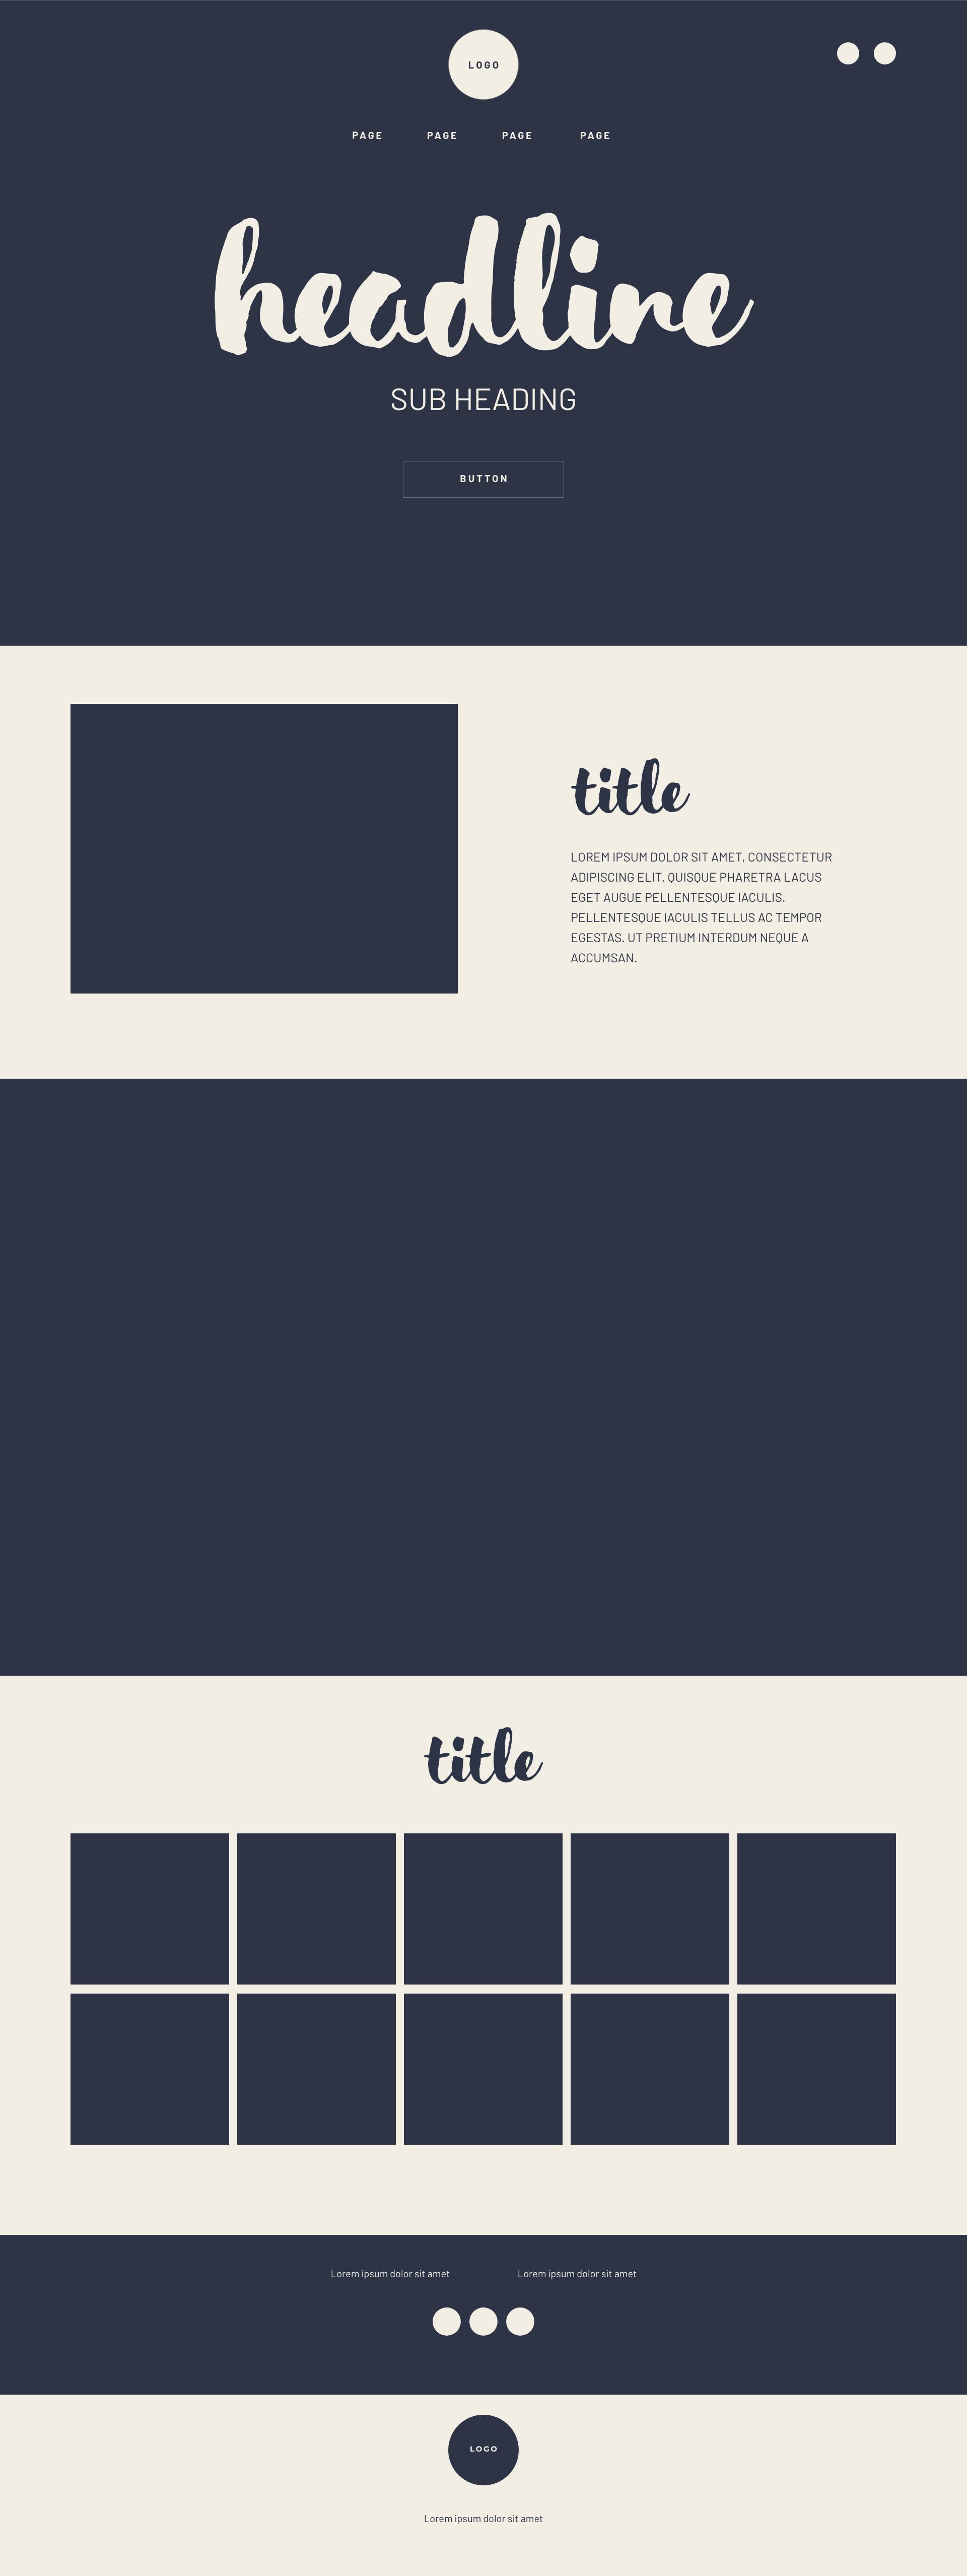 Tyler's Toast logo, branding and web design wireframes